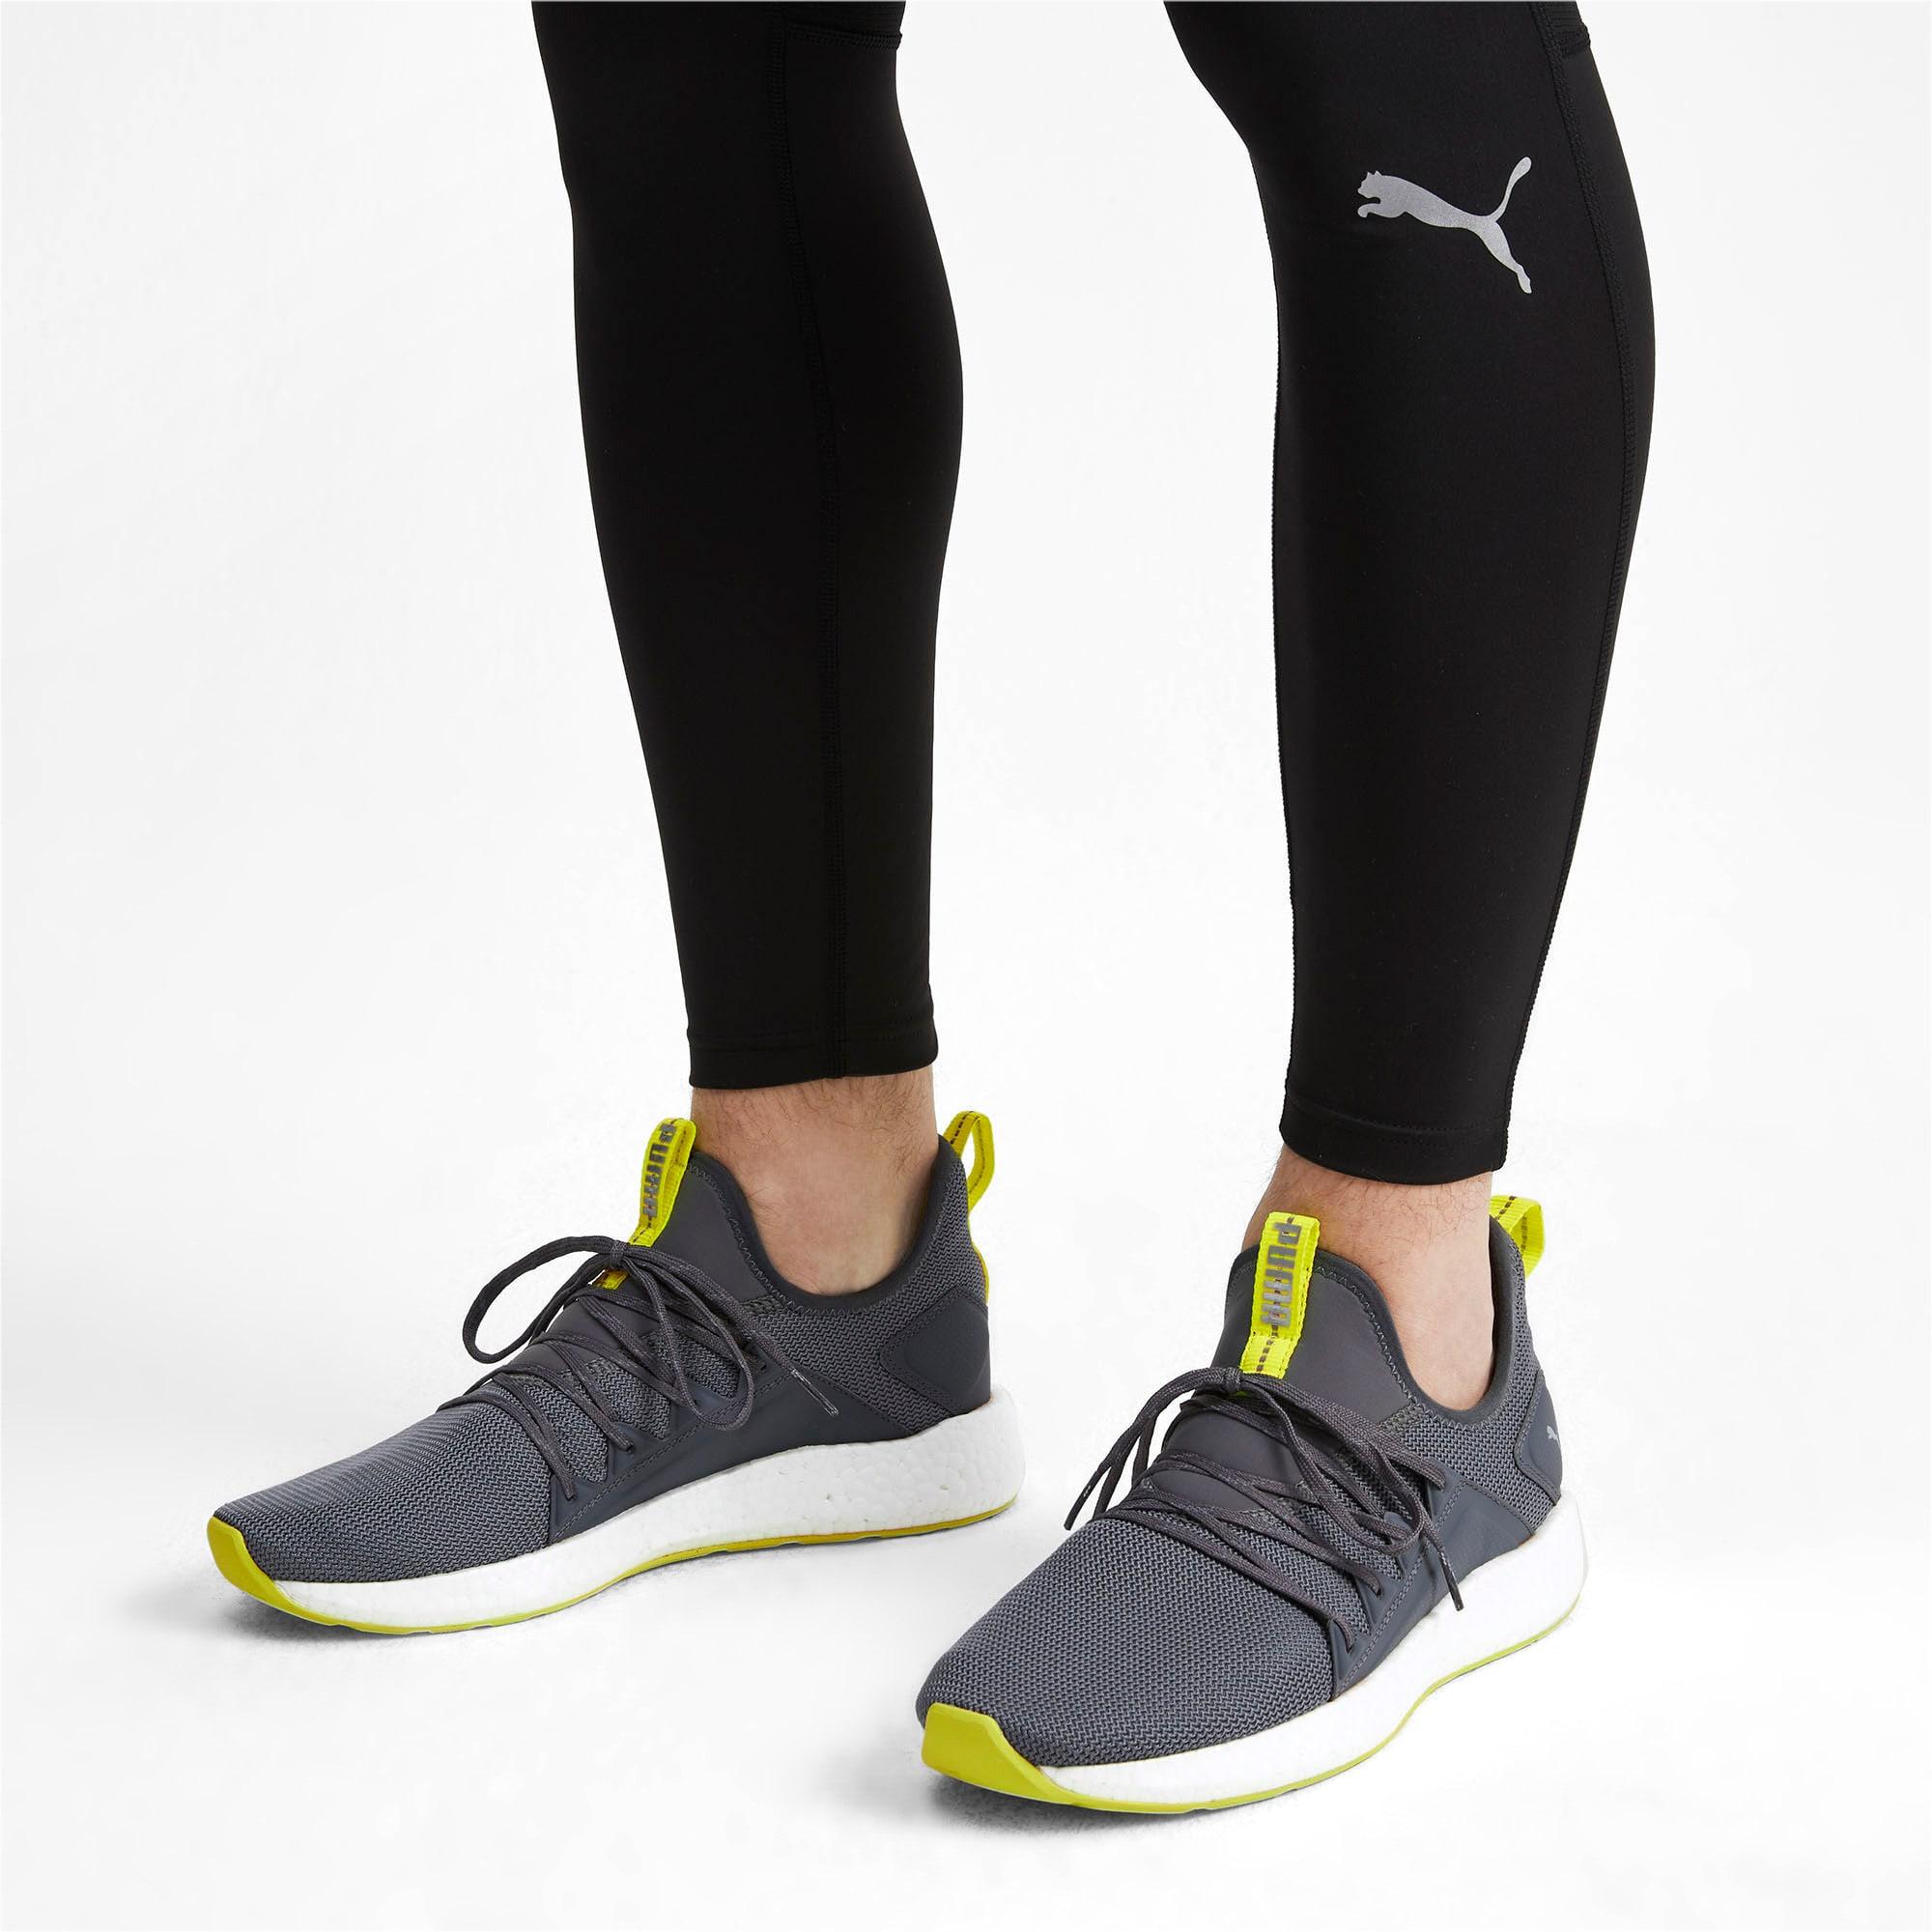 Thumbnail 3 of NRGY Neko Lights Men's Running Shoes, CASTLEROCK-Yellow Alert, medium-IND